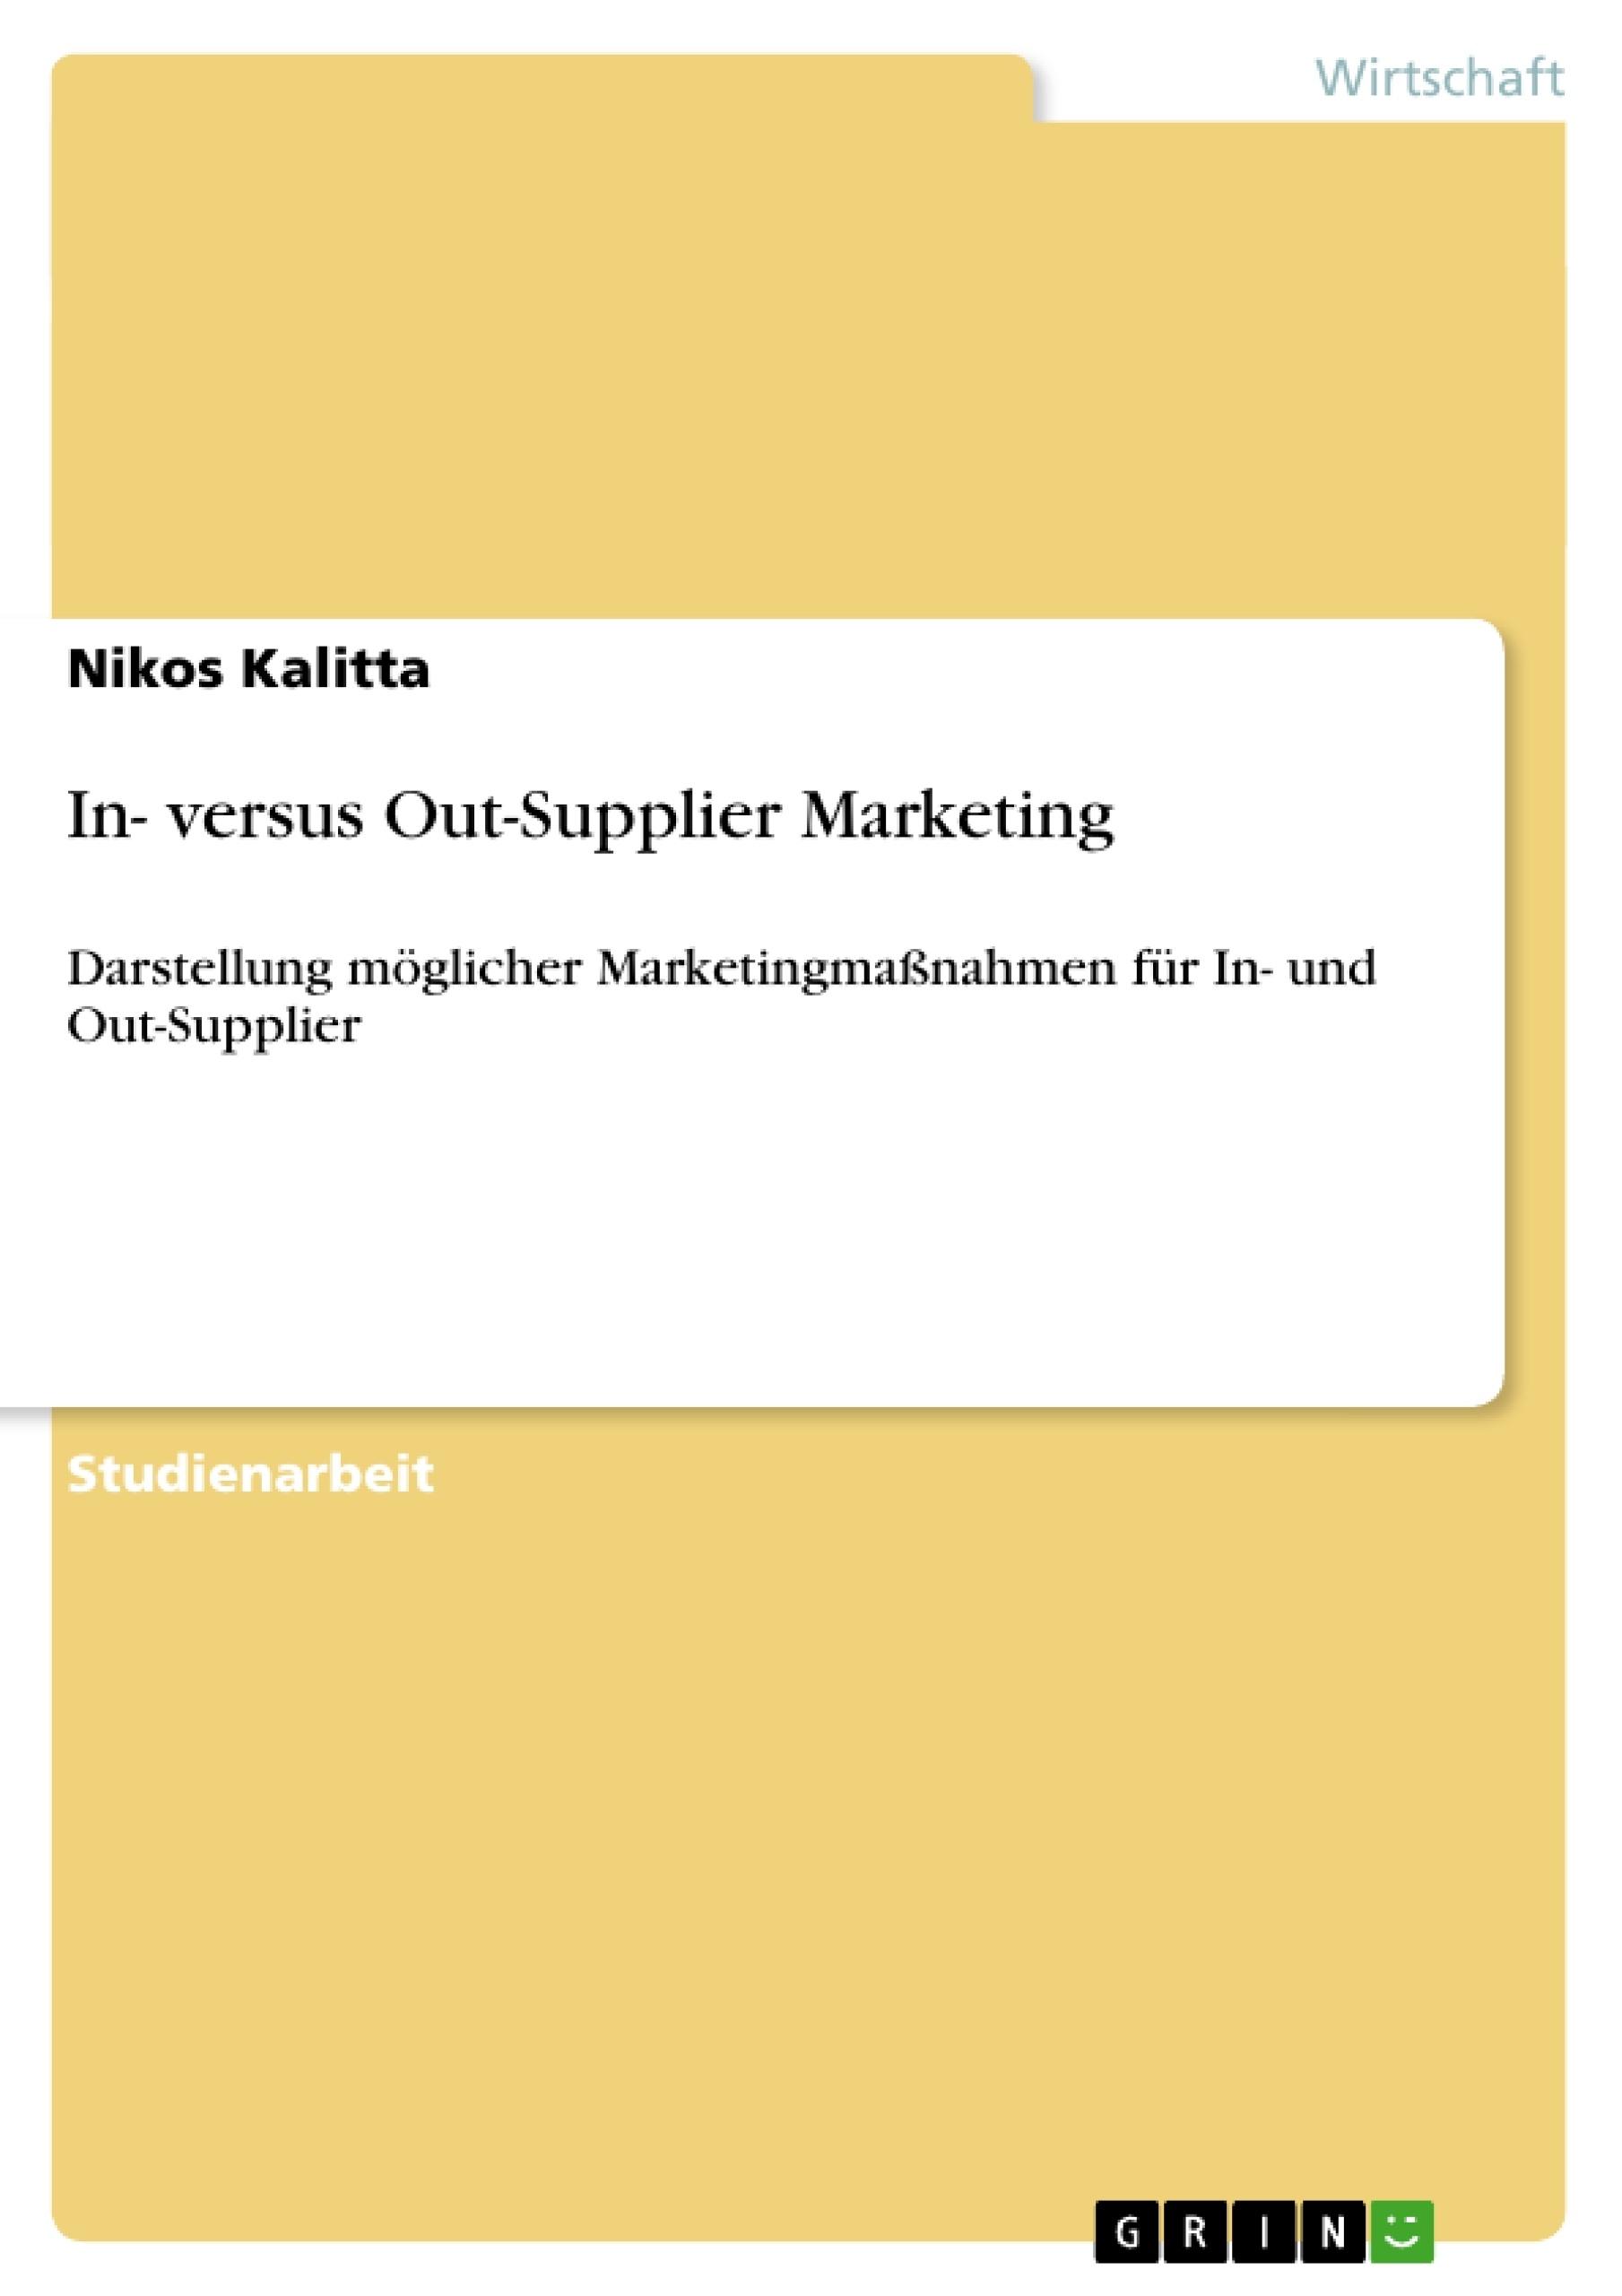 Titel: In- versus Out-Supplier Marketing